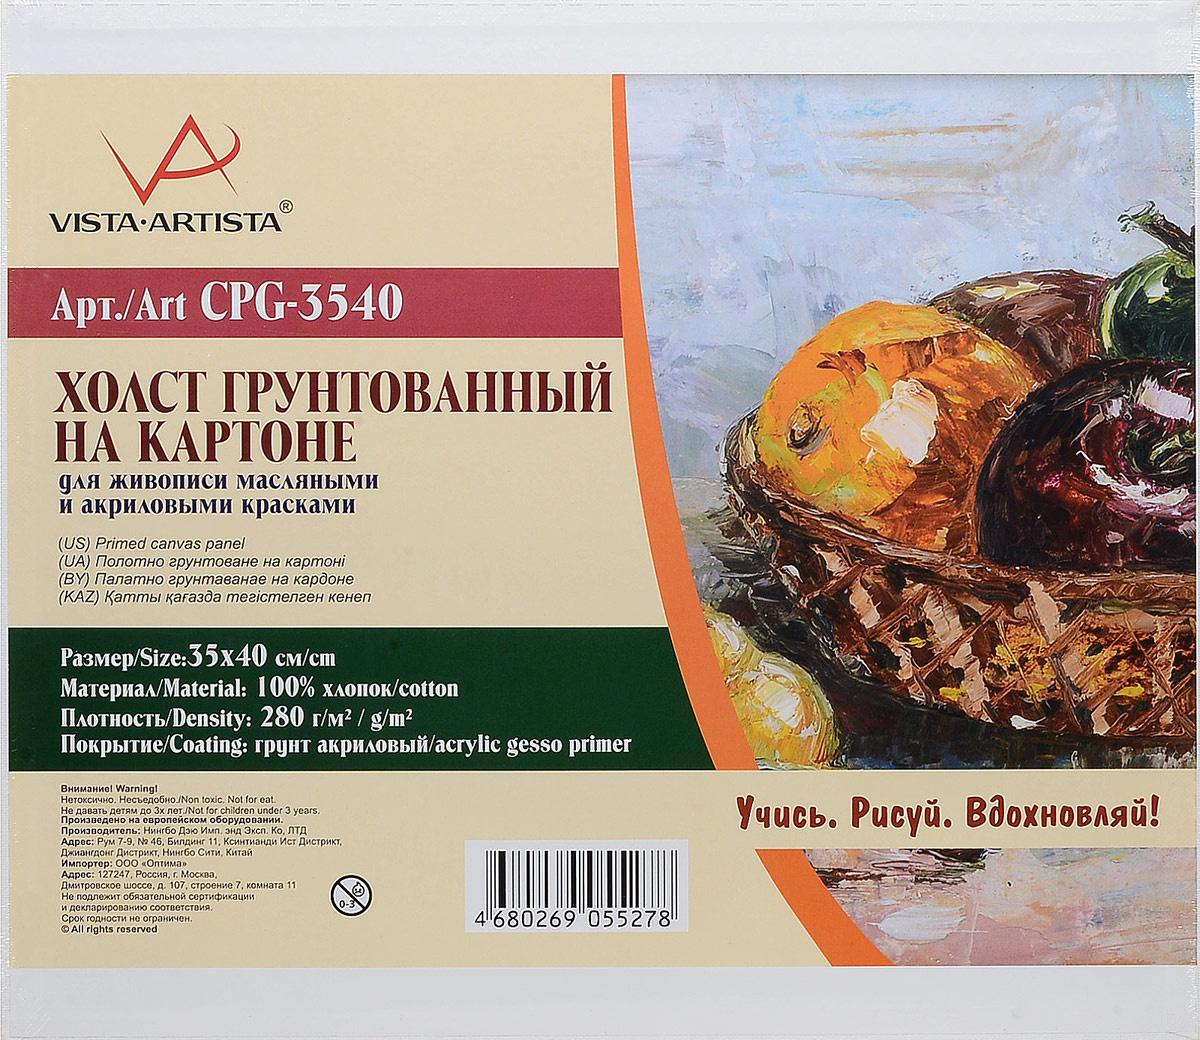 Vista-Artista Холст грунтованный CPG-3540 #1